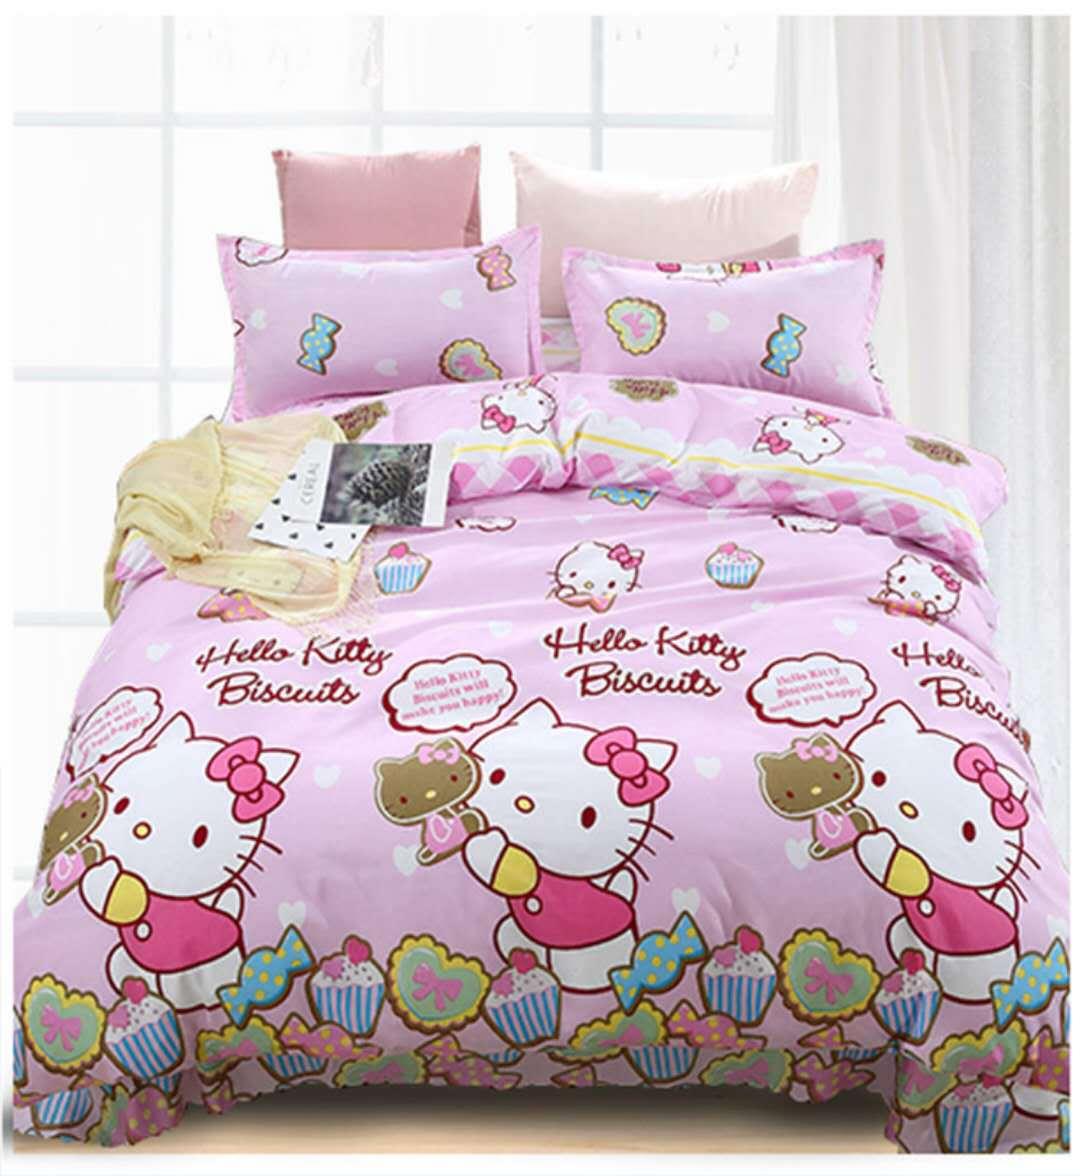 Bedding Set Cartoon Happy Cat Flamingo Rabbit Scenery 4/3pcs Duvet Cover Sets Soft Polyester Flat Bed Sheet Set Pillowcase